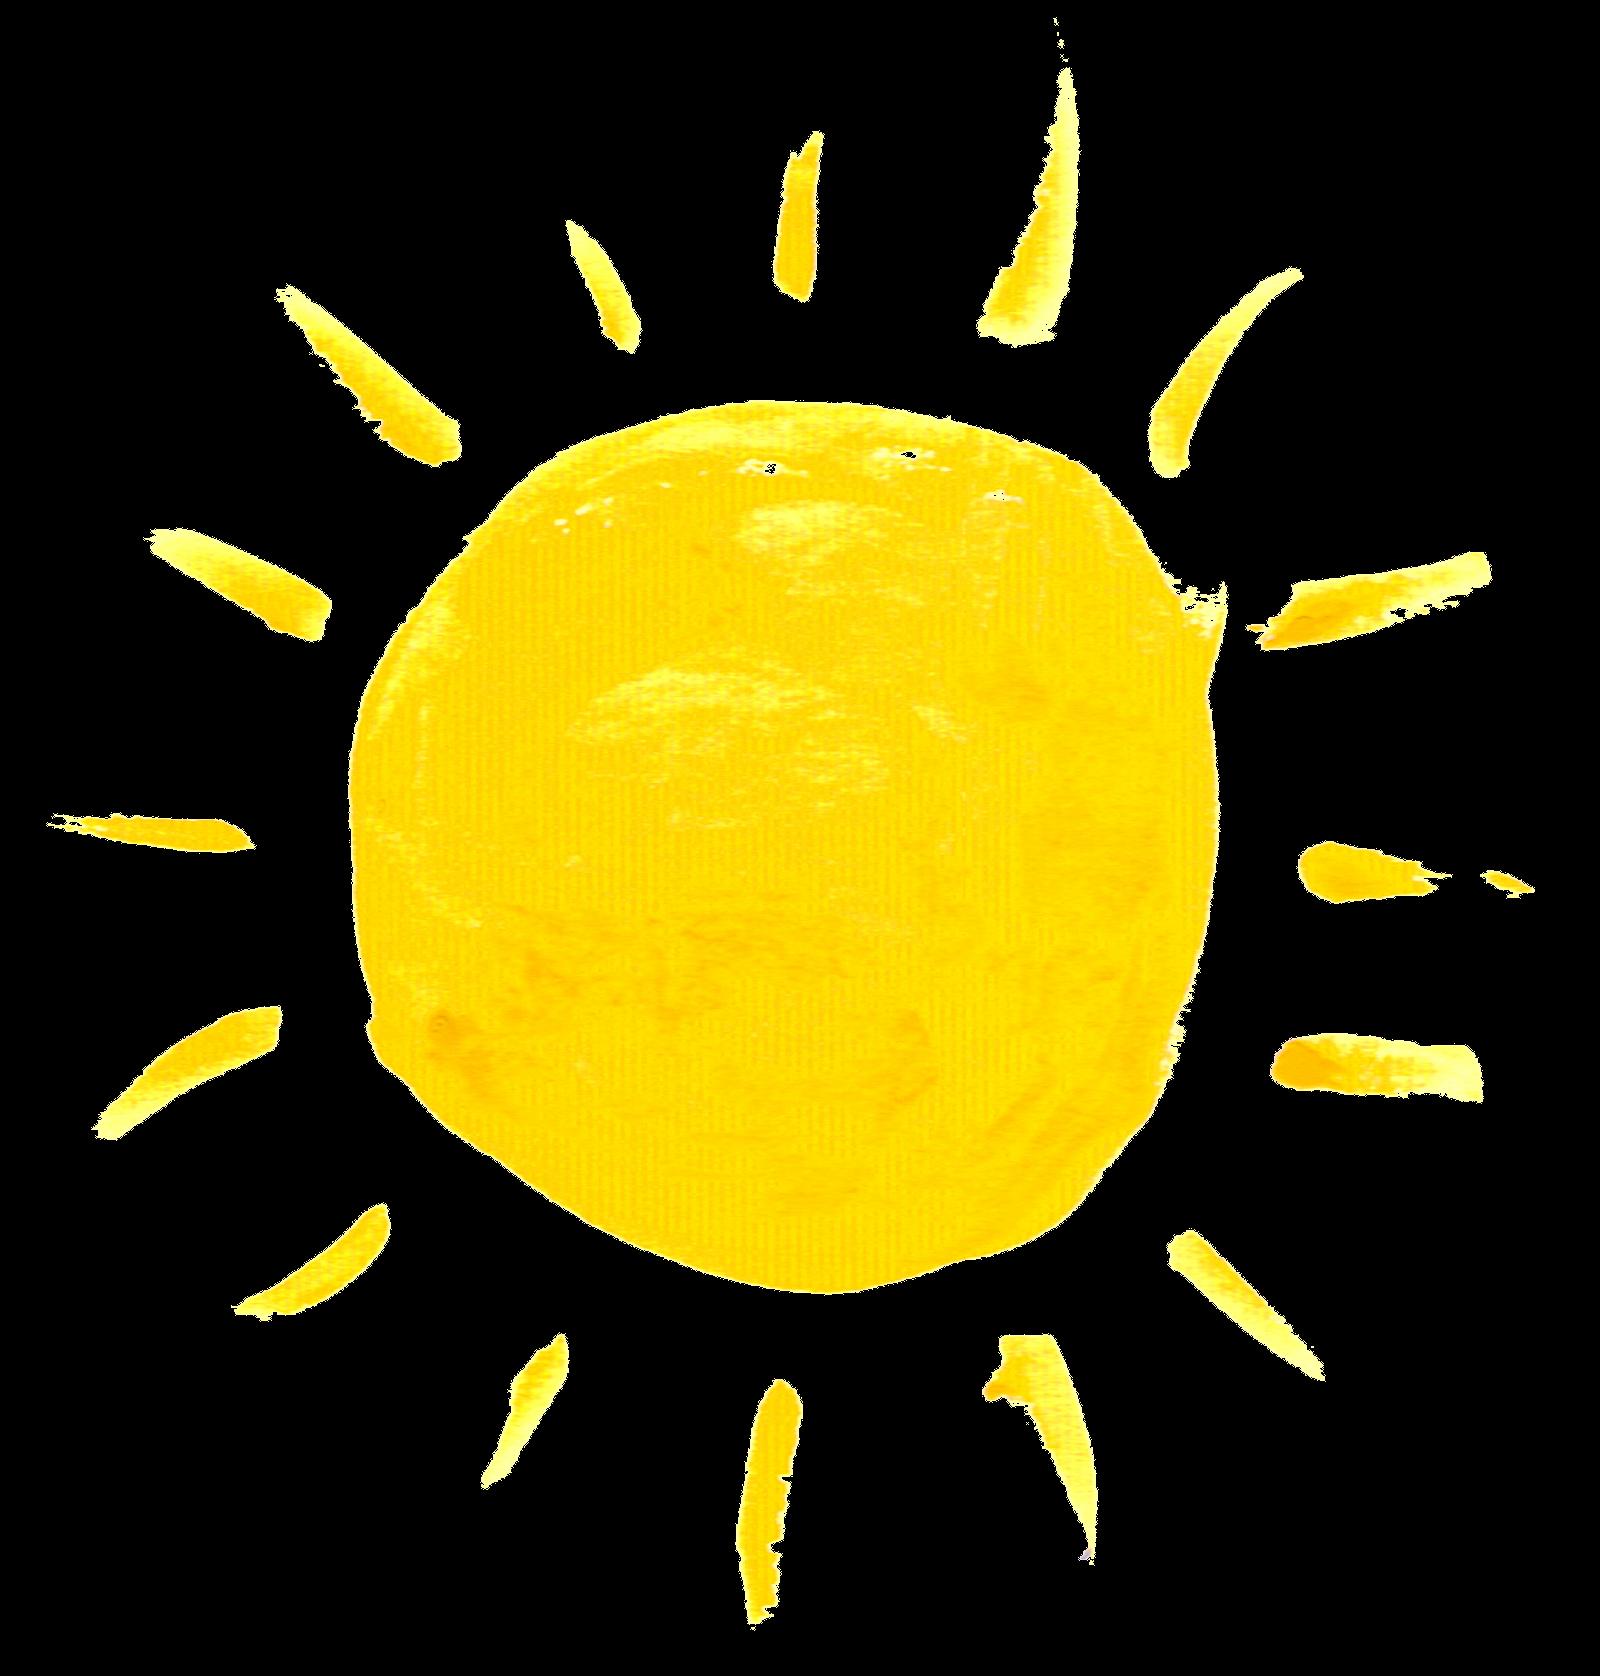 Baby sun images transparentpng. Clipart sunshine watercolor